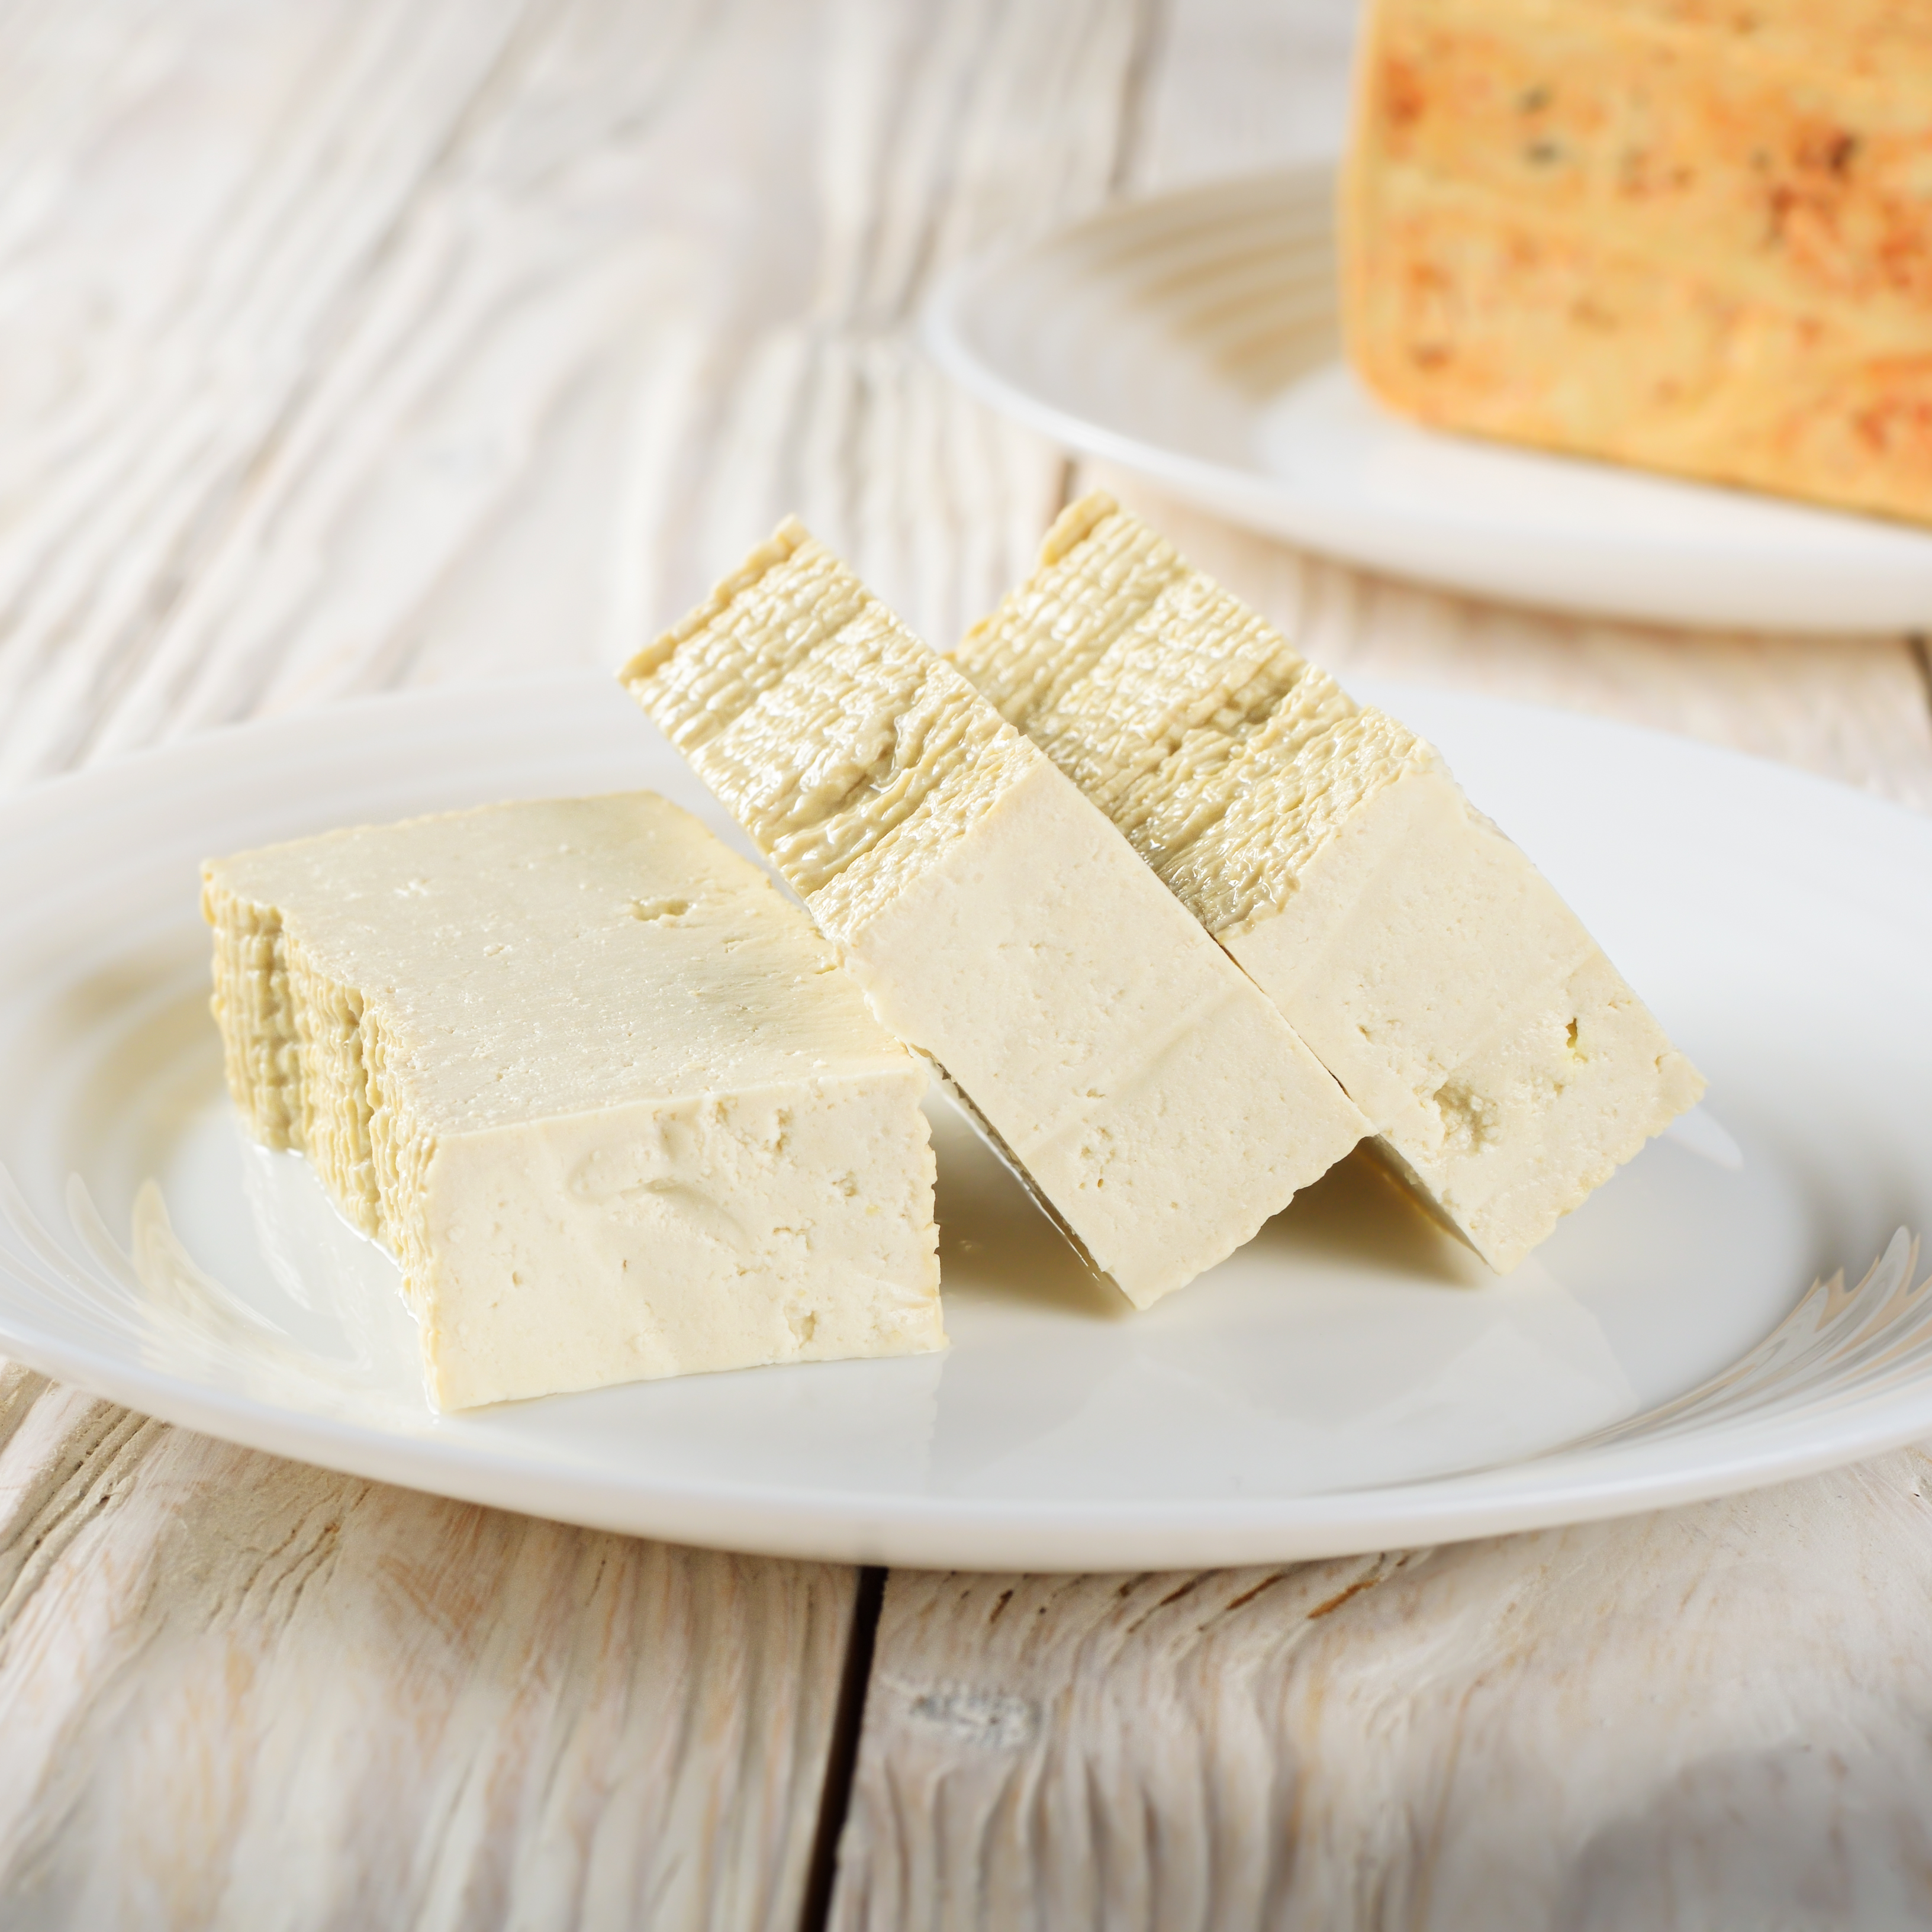 How To Thaw Tofu